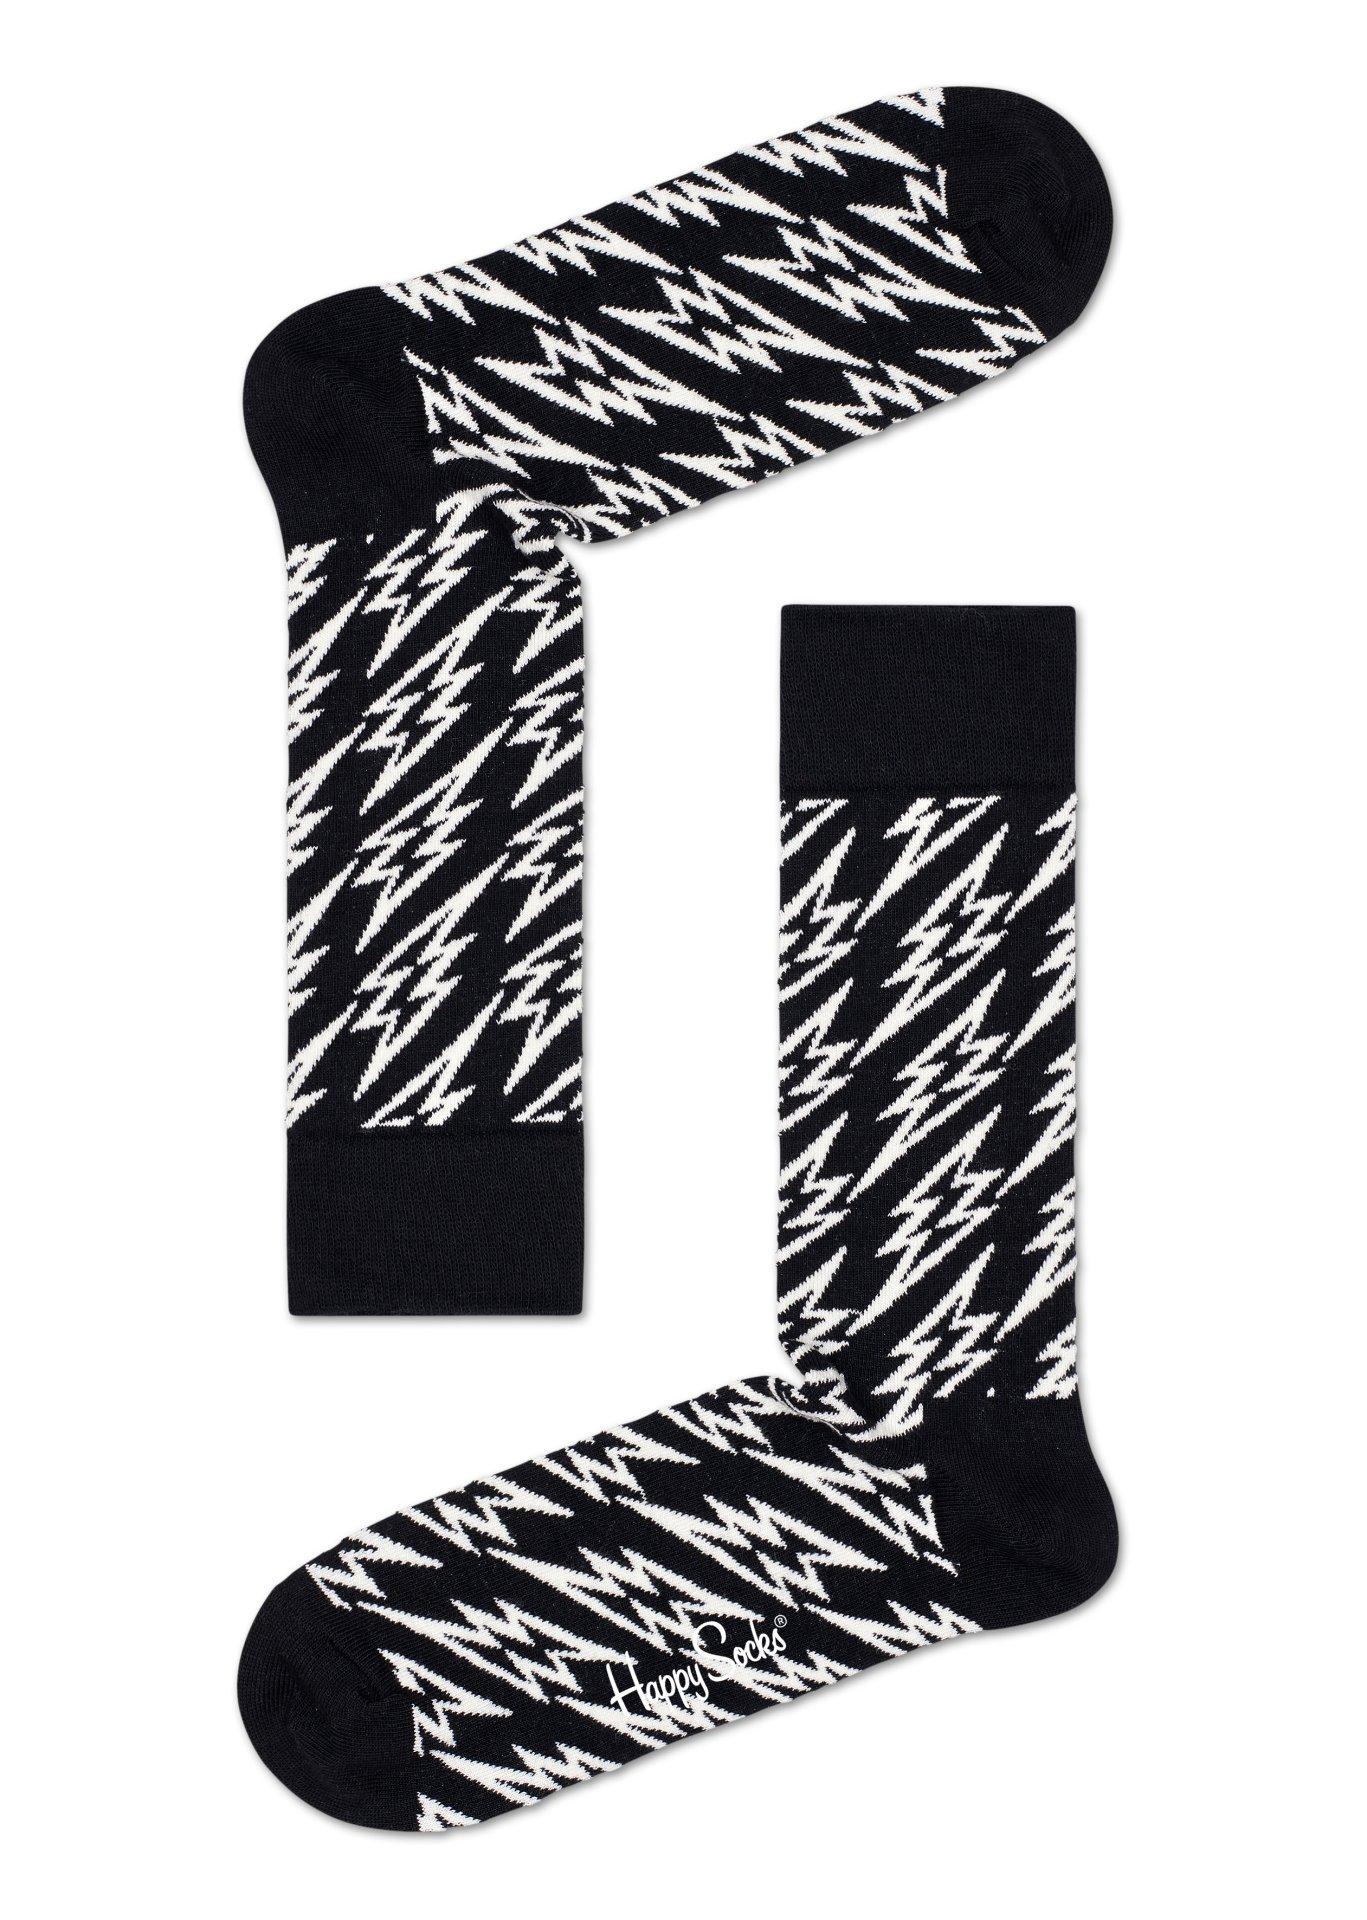 Happy Socks Flash Lightning 1 paar kousen 41-46